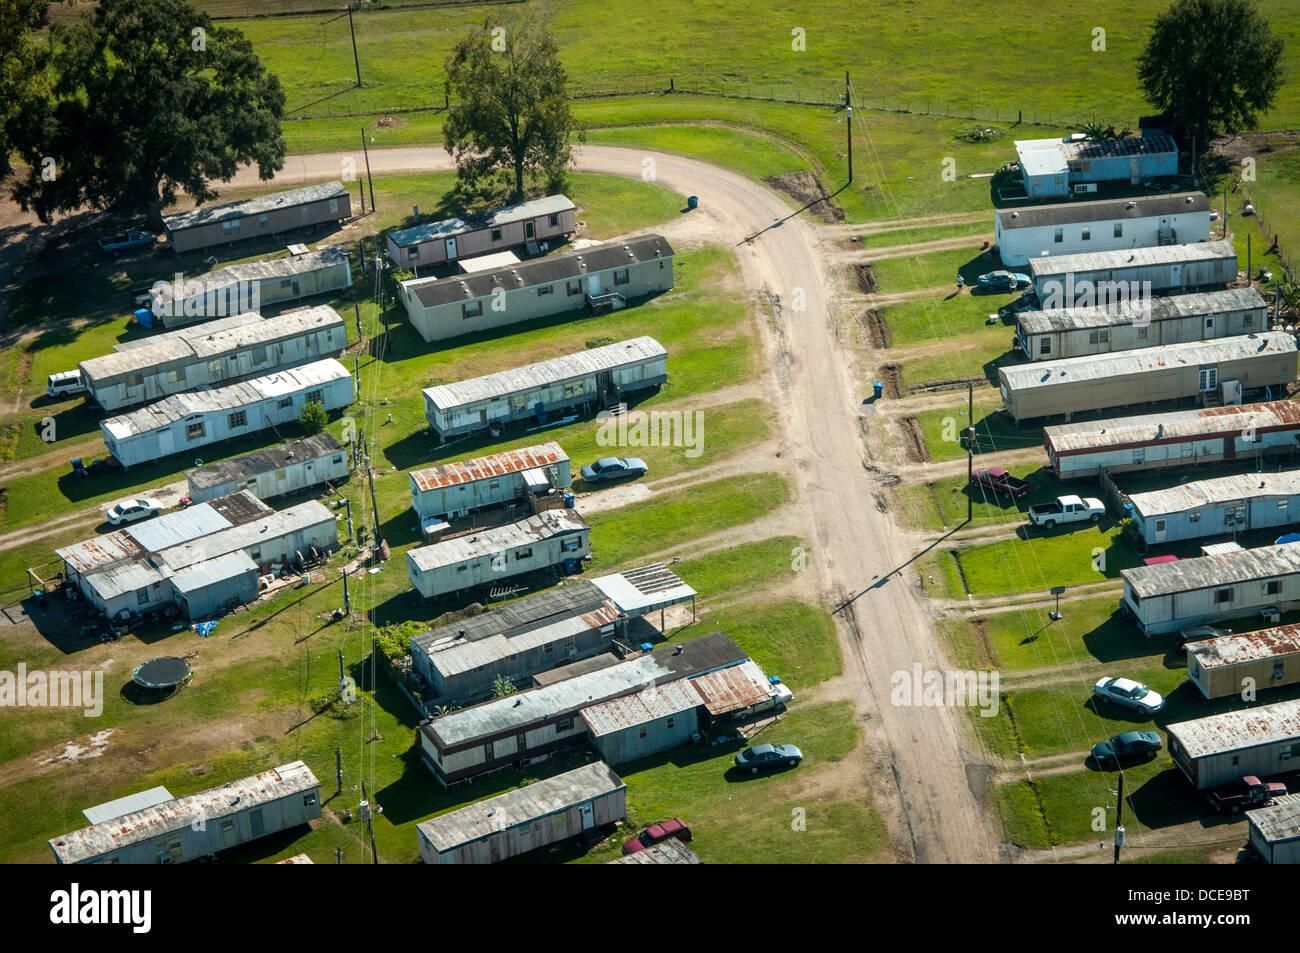 USA, Louisiana, Atchafalaya Basin area, St. Martin Parish, trailer park just outside of West Atchafalaya Basin Protection Stock Photo